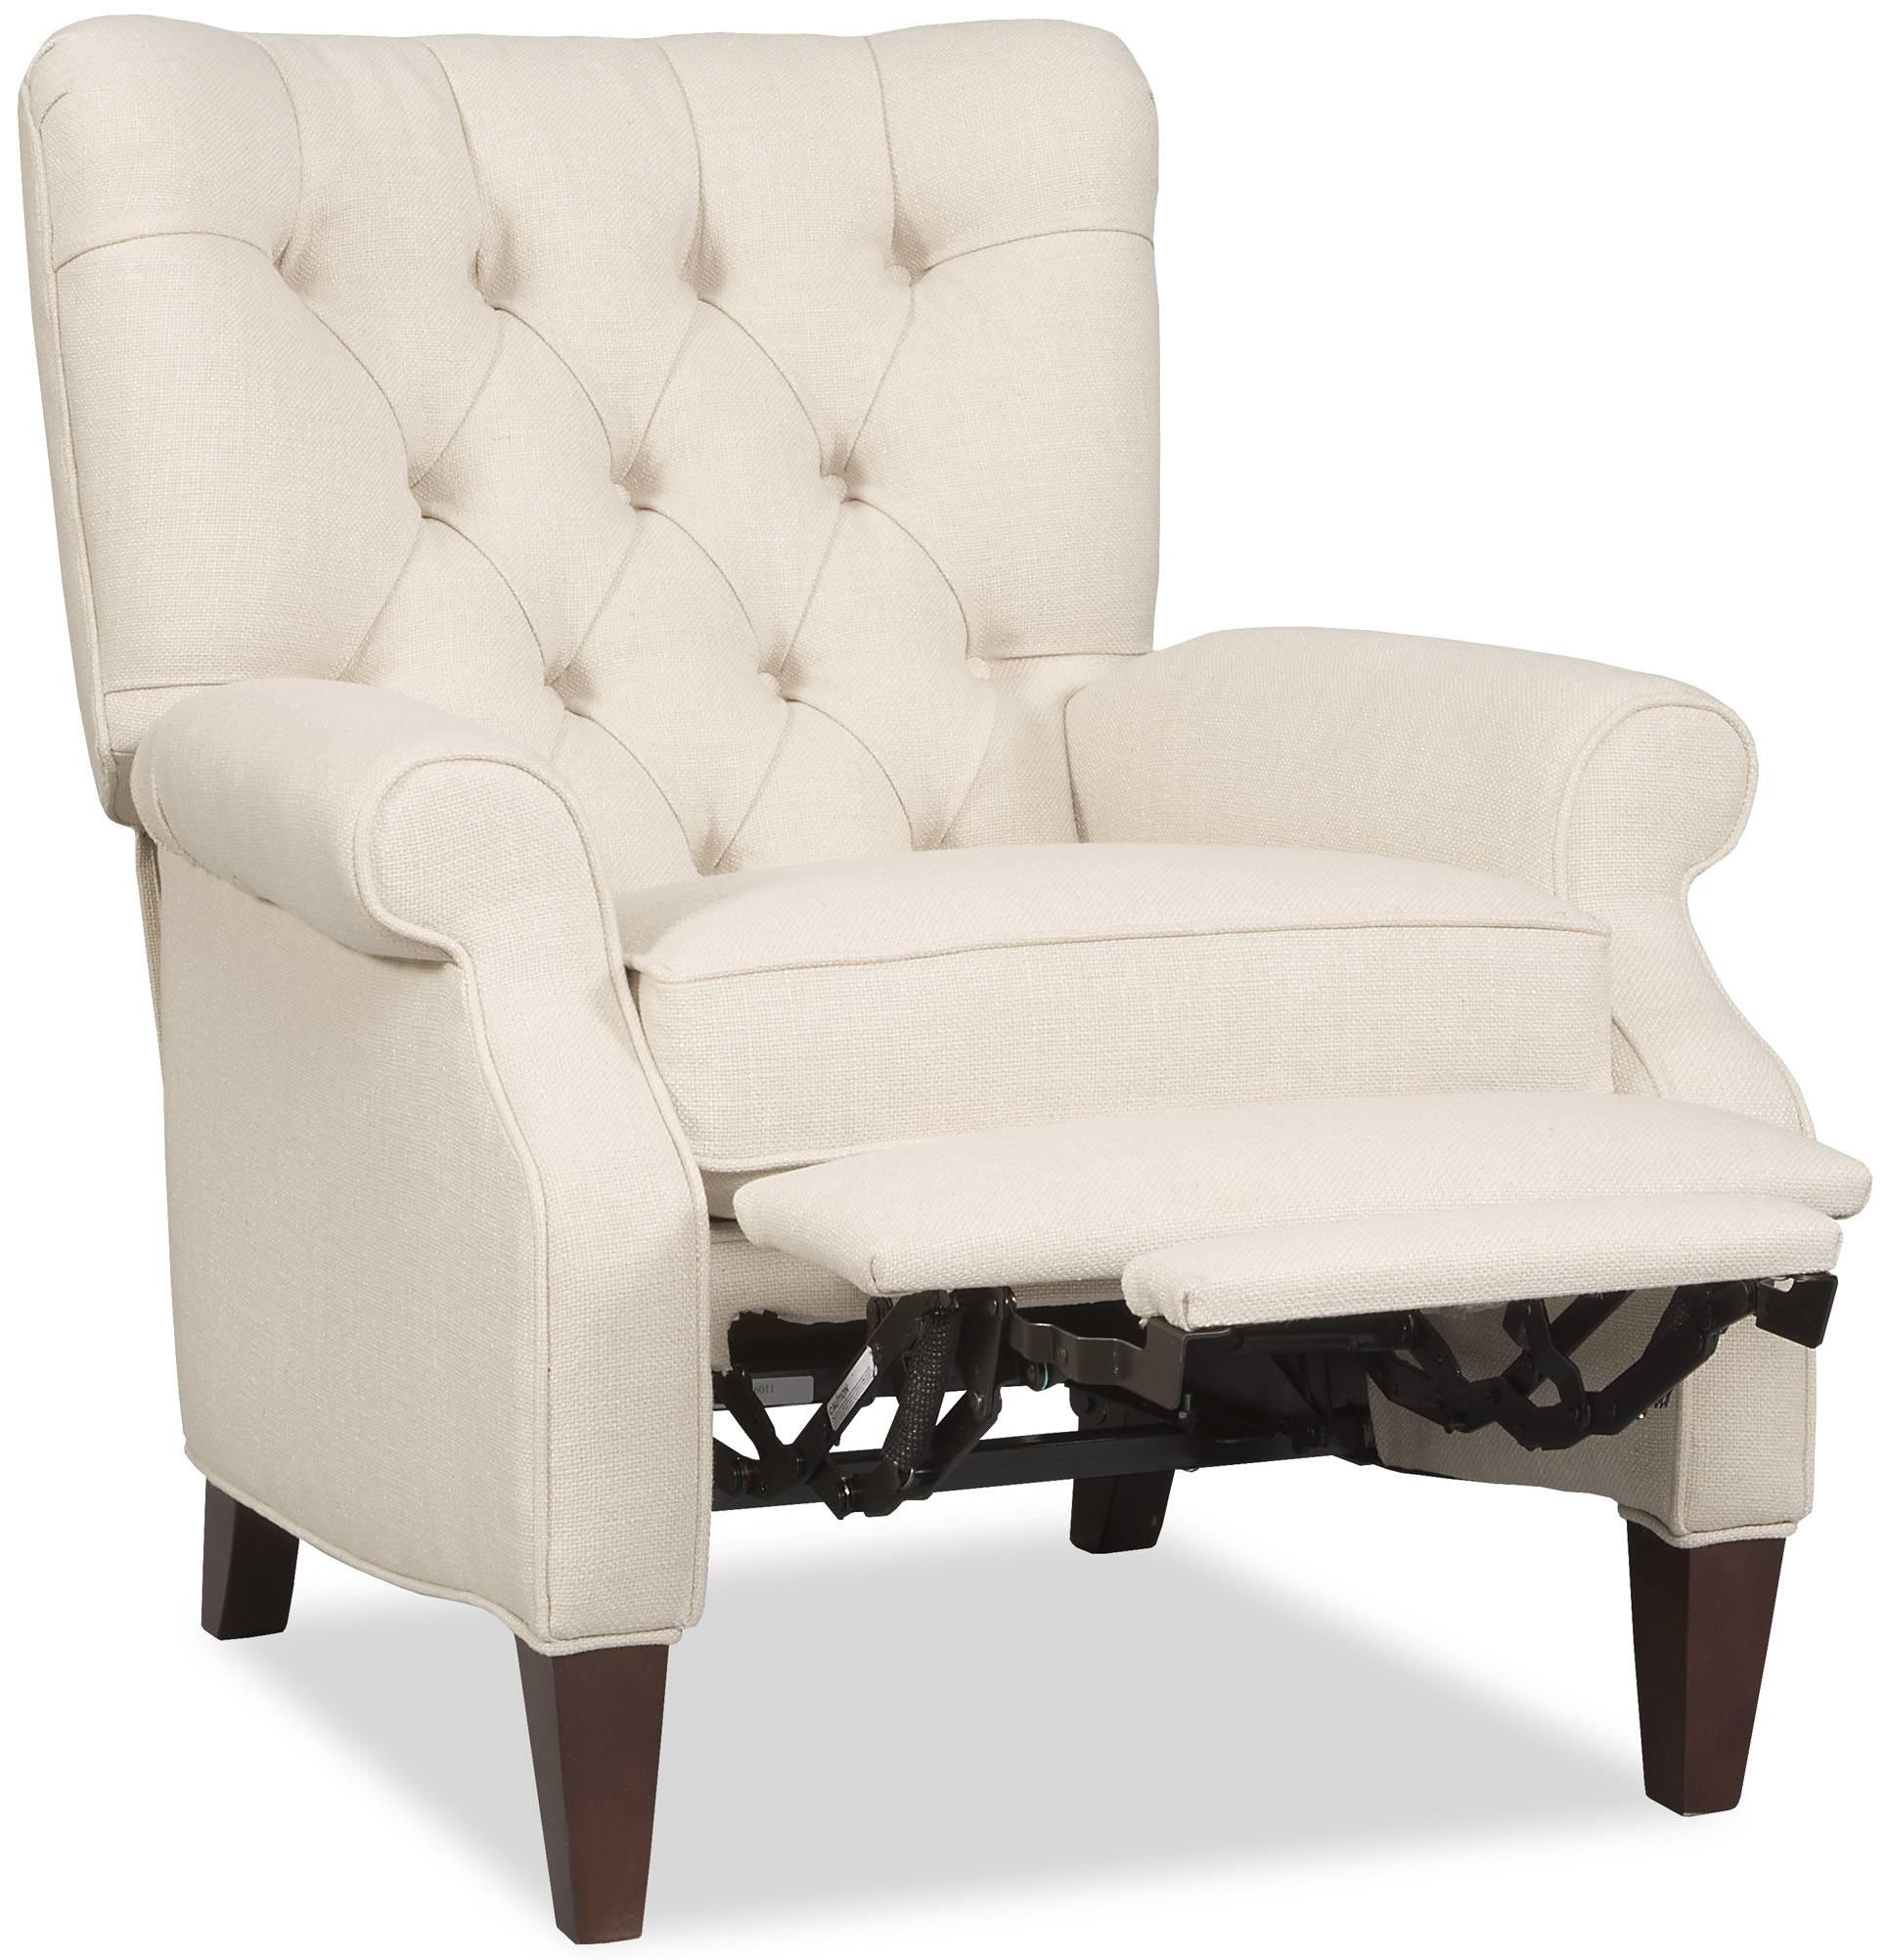 Sam Moore Living Room Annick Recliner 5910 Sam Moore